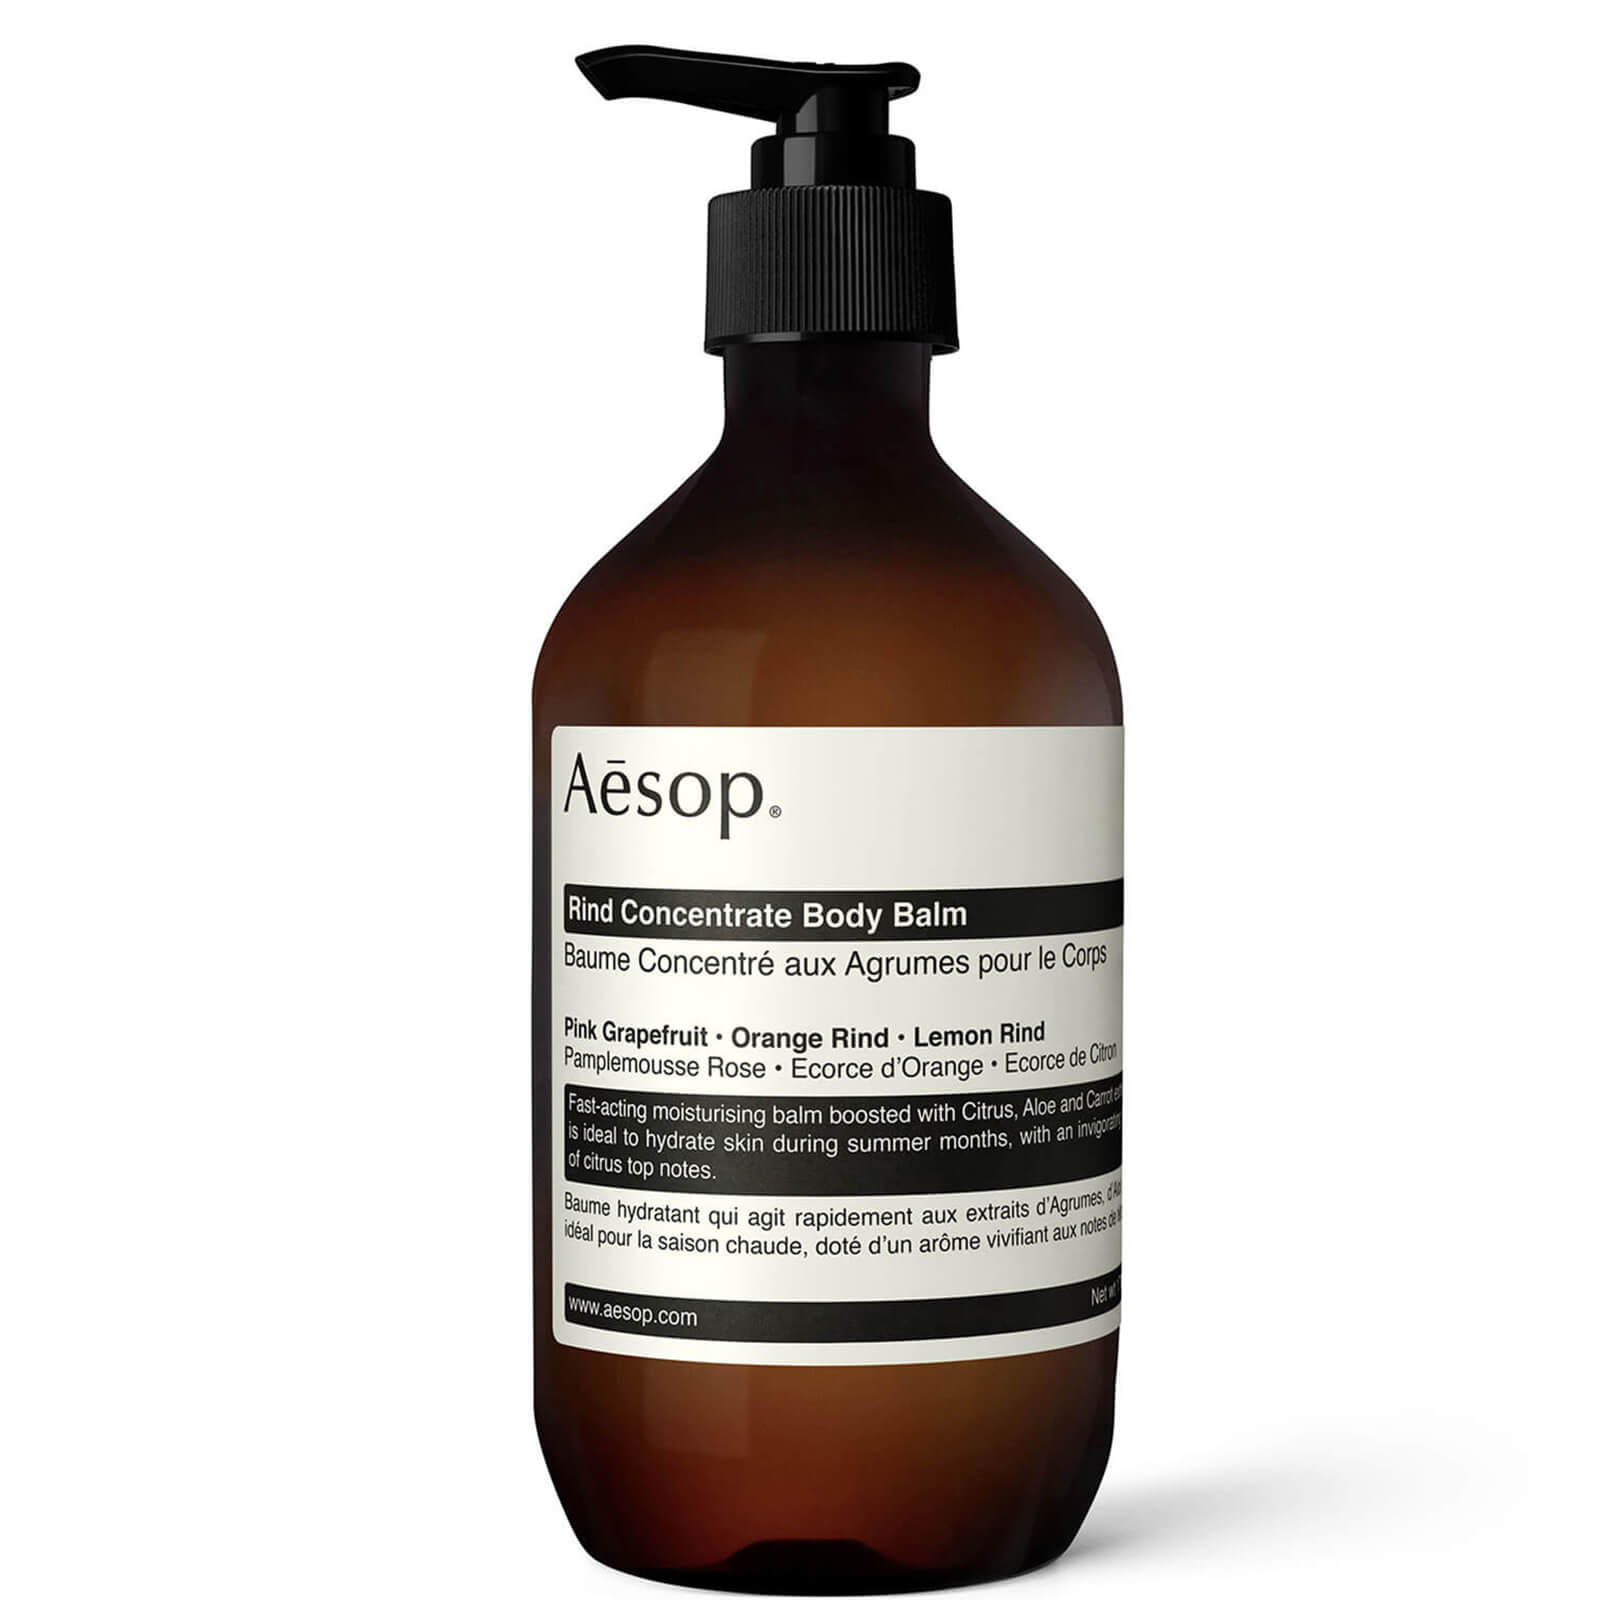 Купить Aesop Rind Concentrate Body Balm 500ml